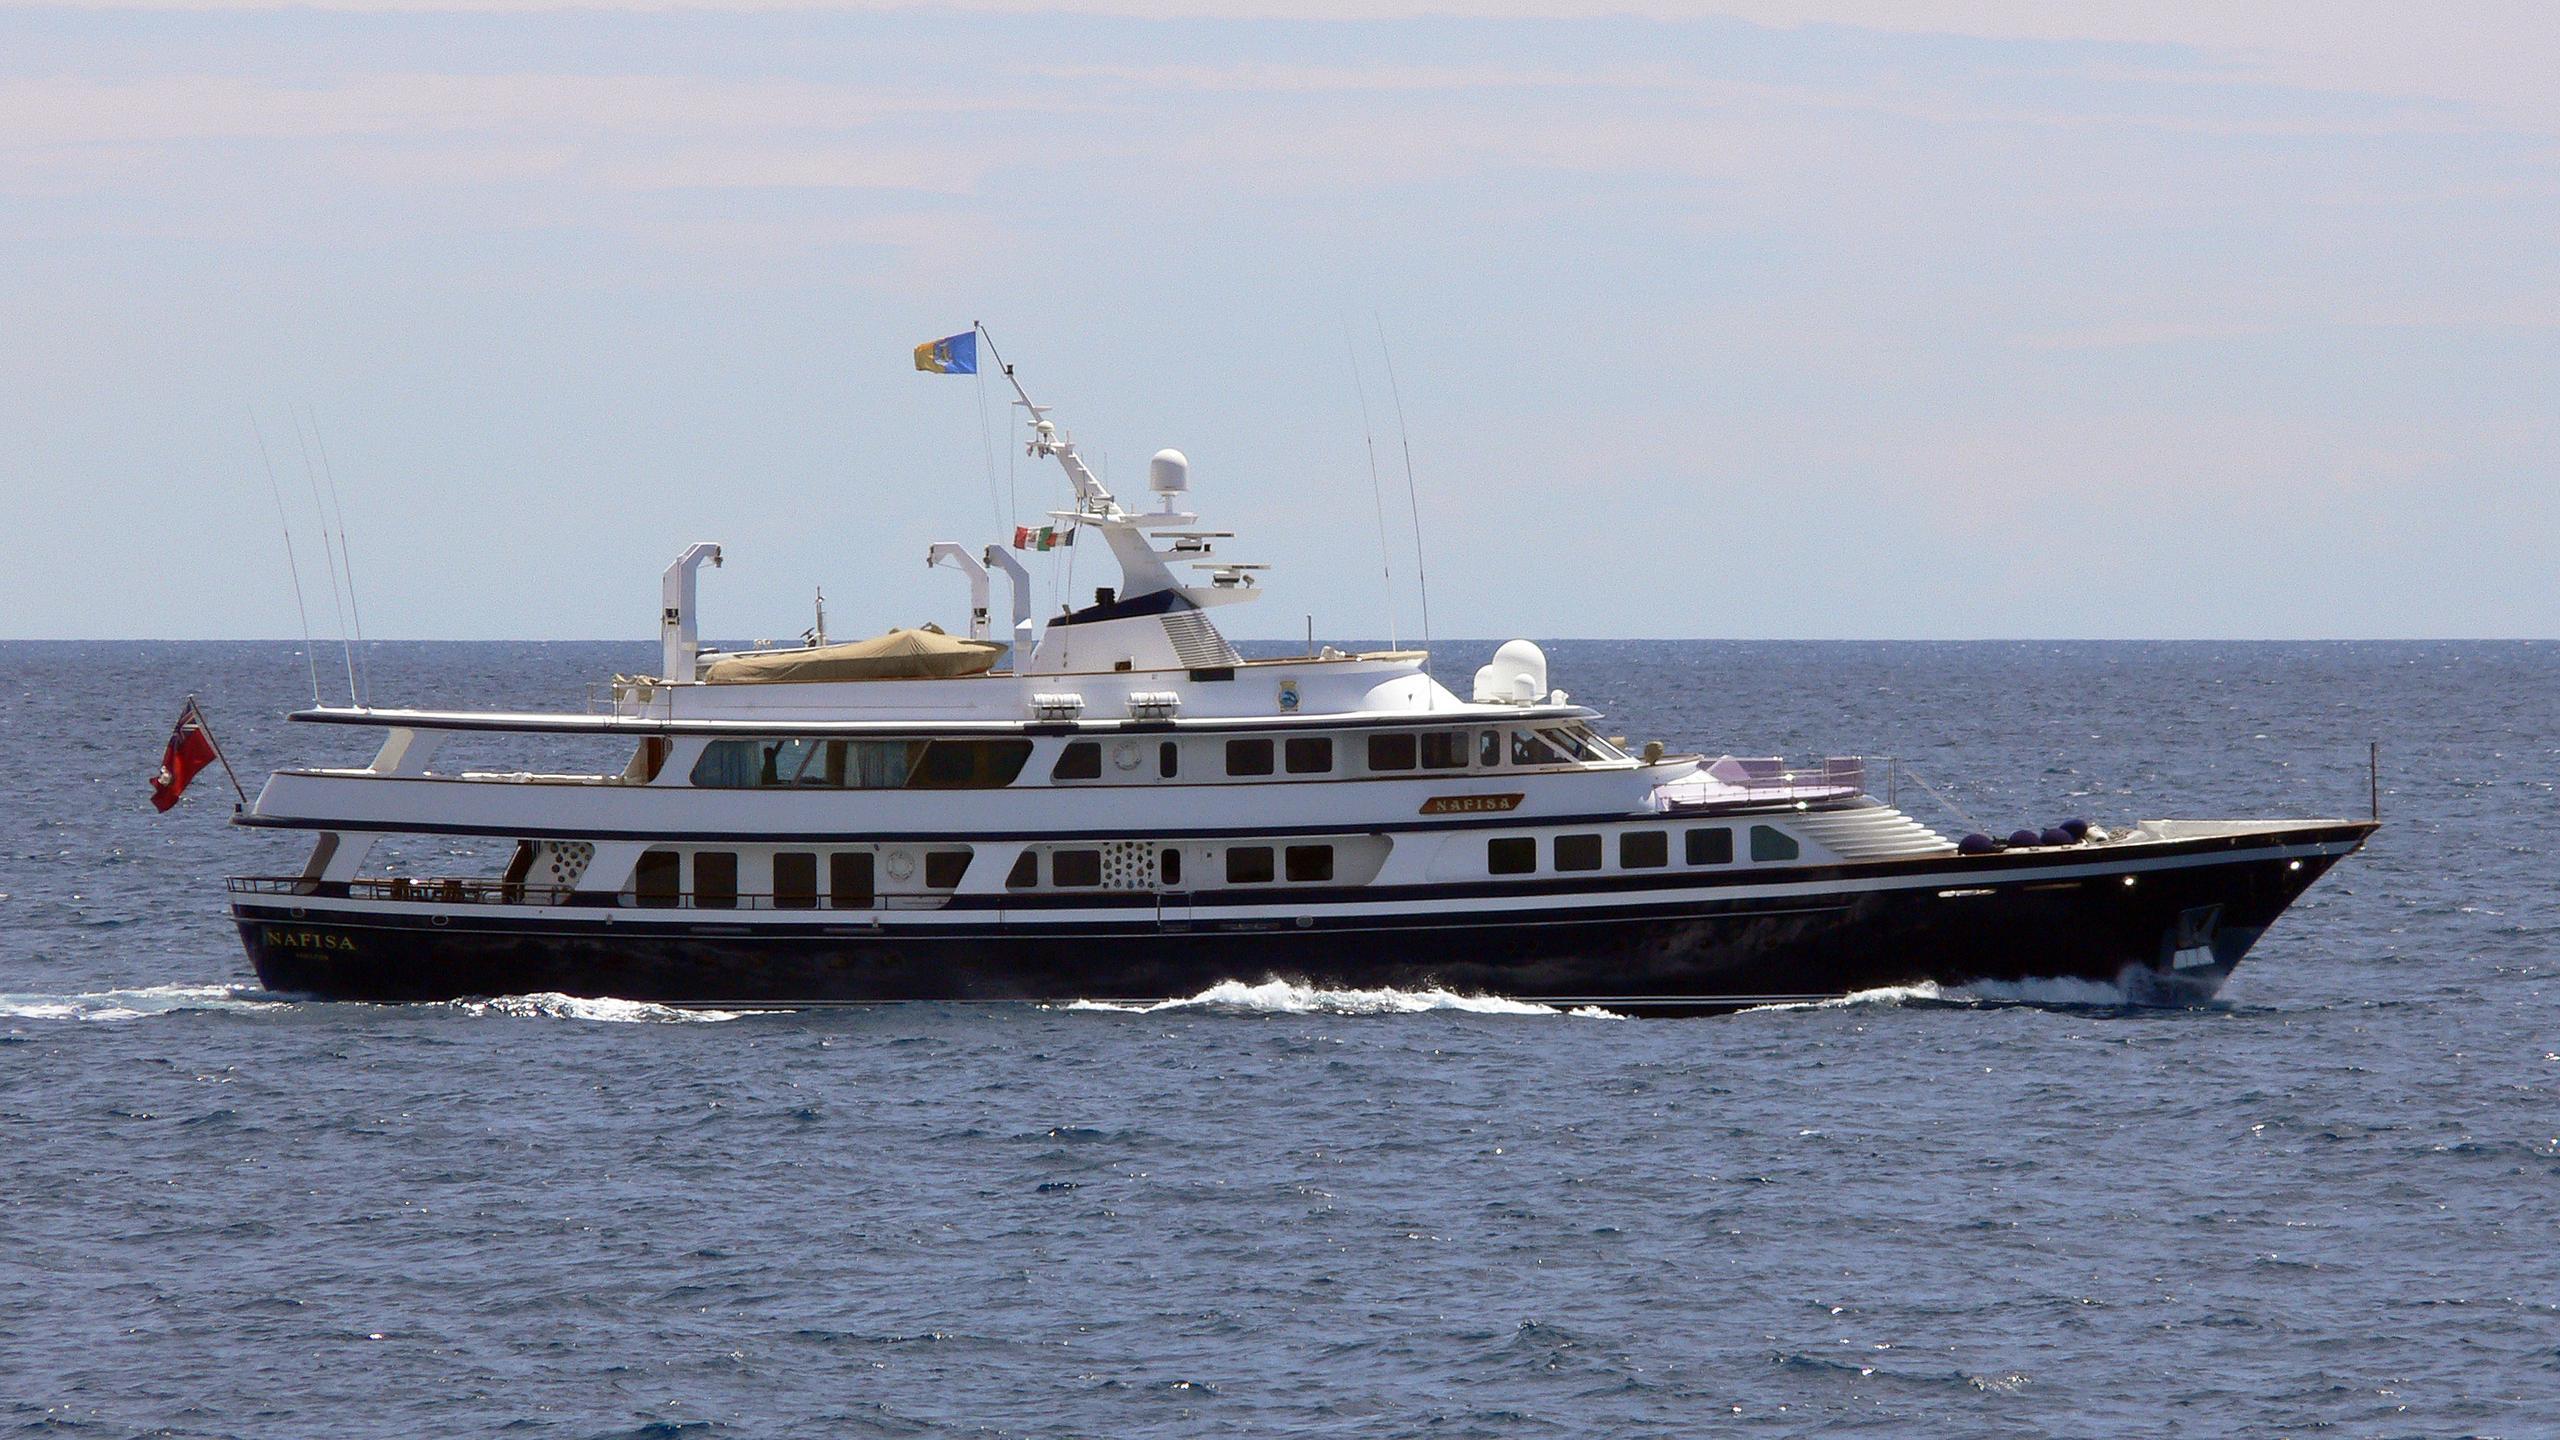 nafisa-motor-yacht-schweers-1986-49m-cruising-profile